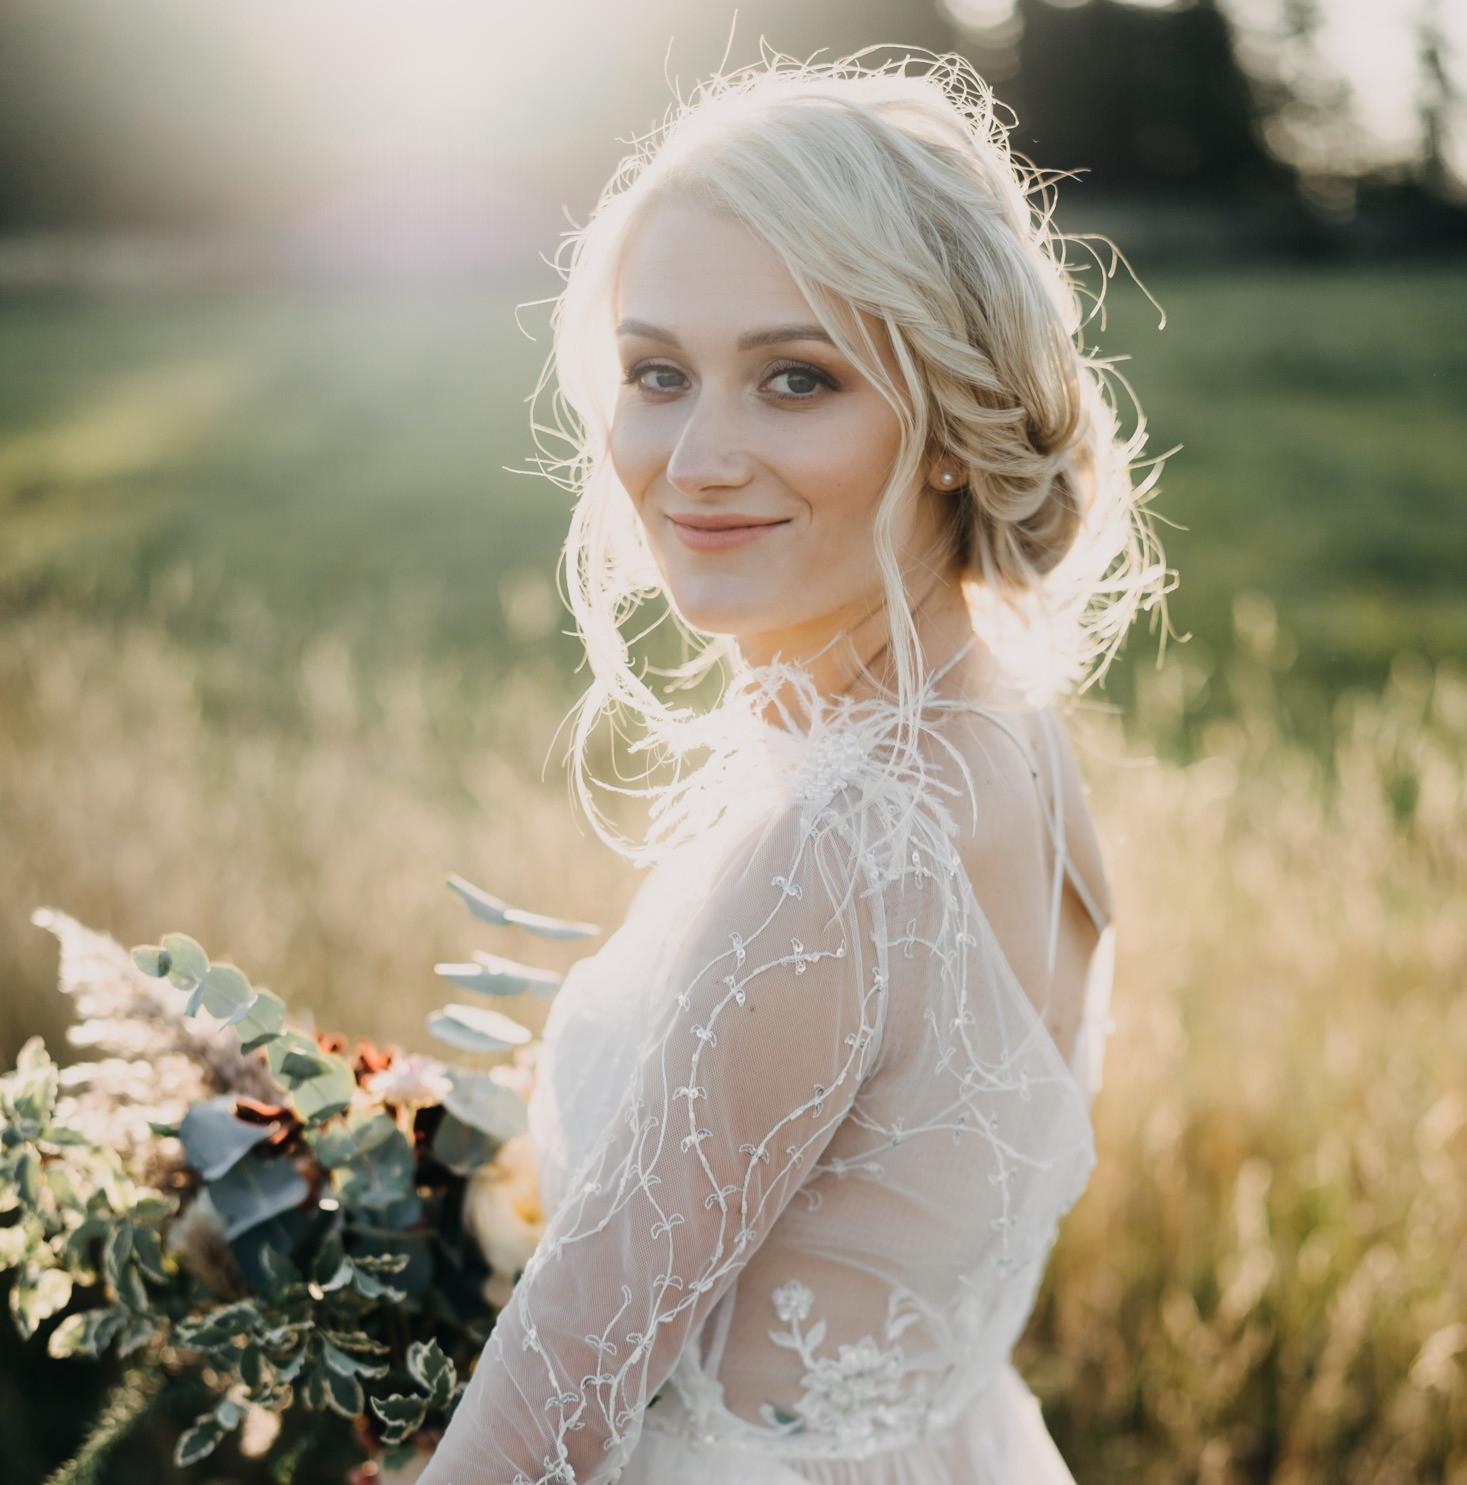 Bridal Make-up & Hair - Wedding day